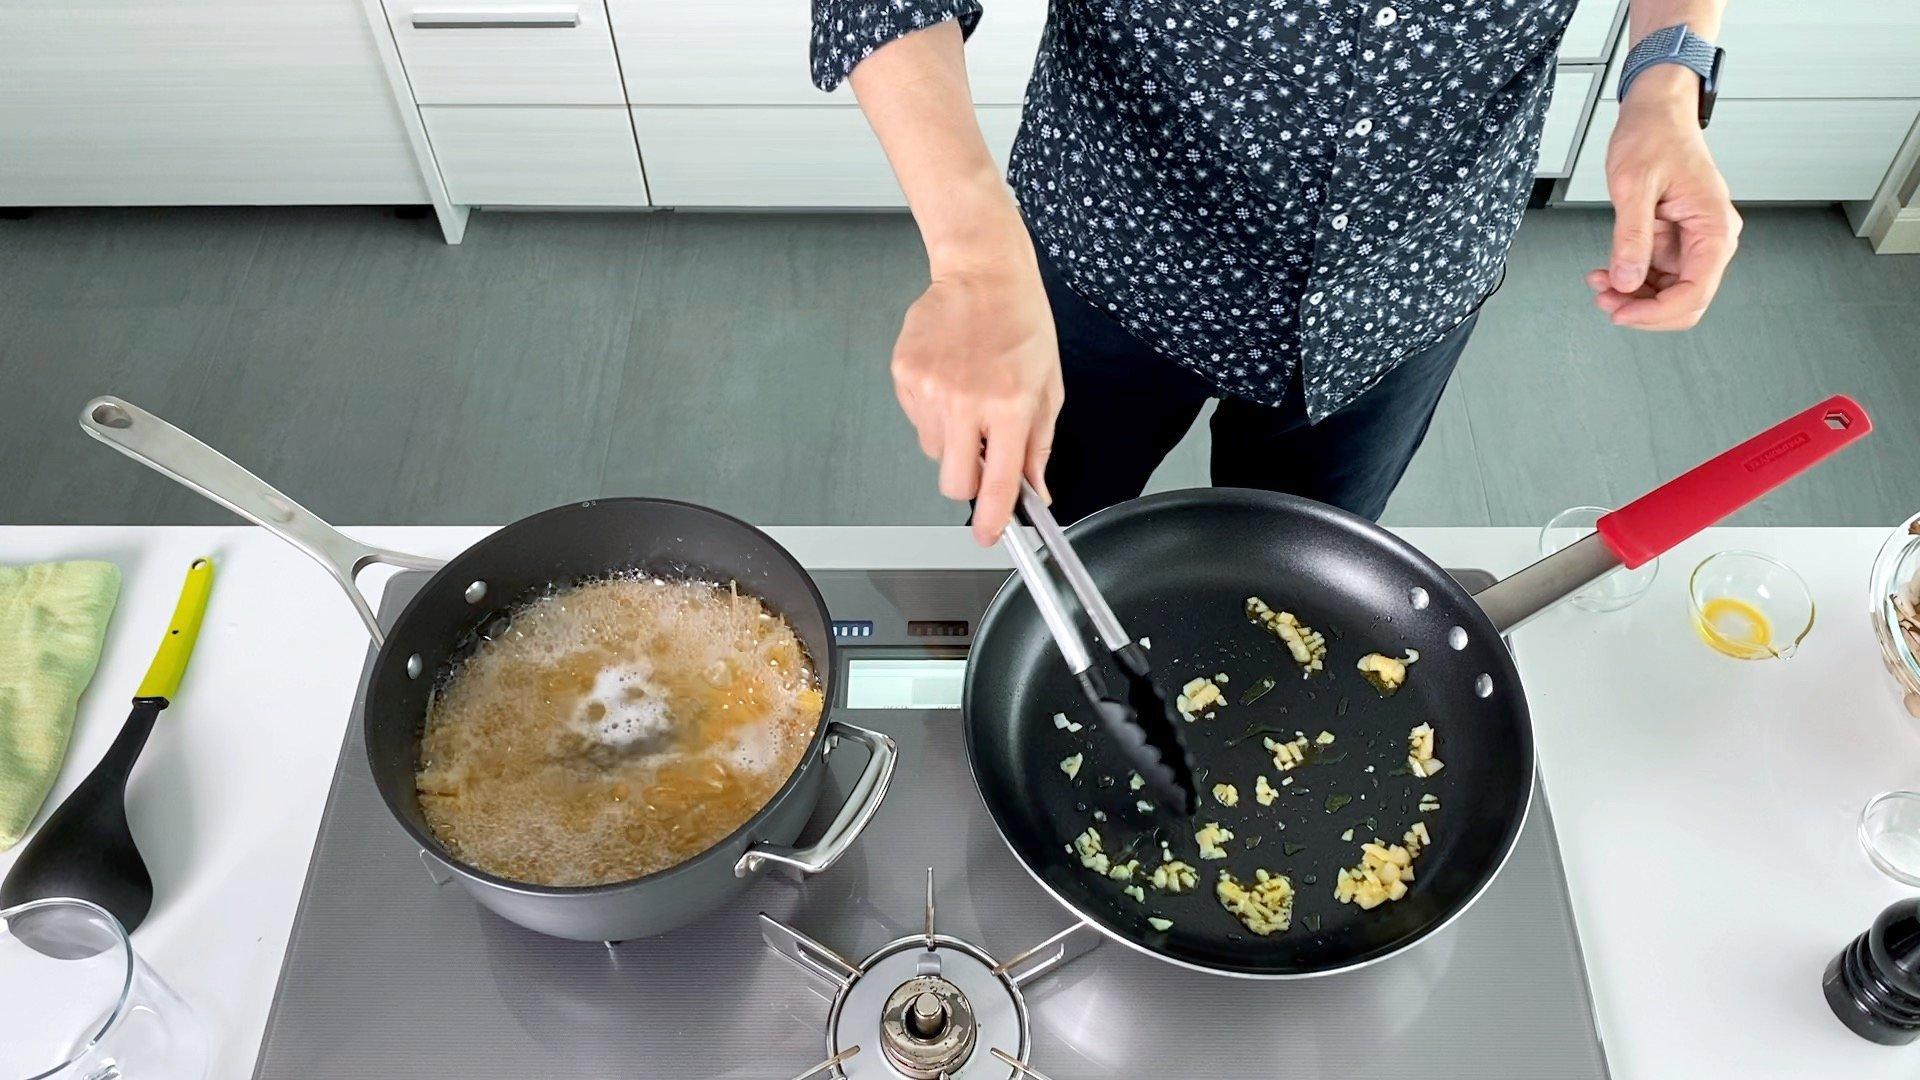 Sautéing garlic in a frying pan for pasta.